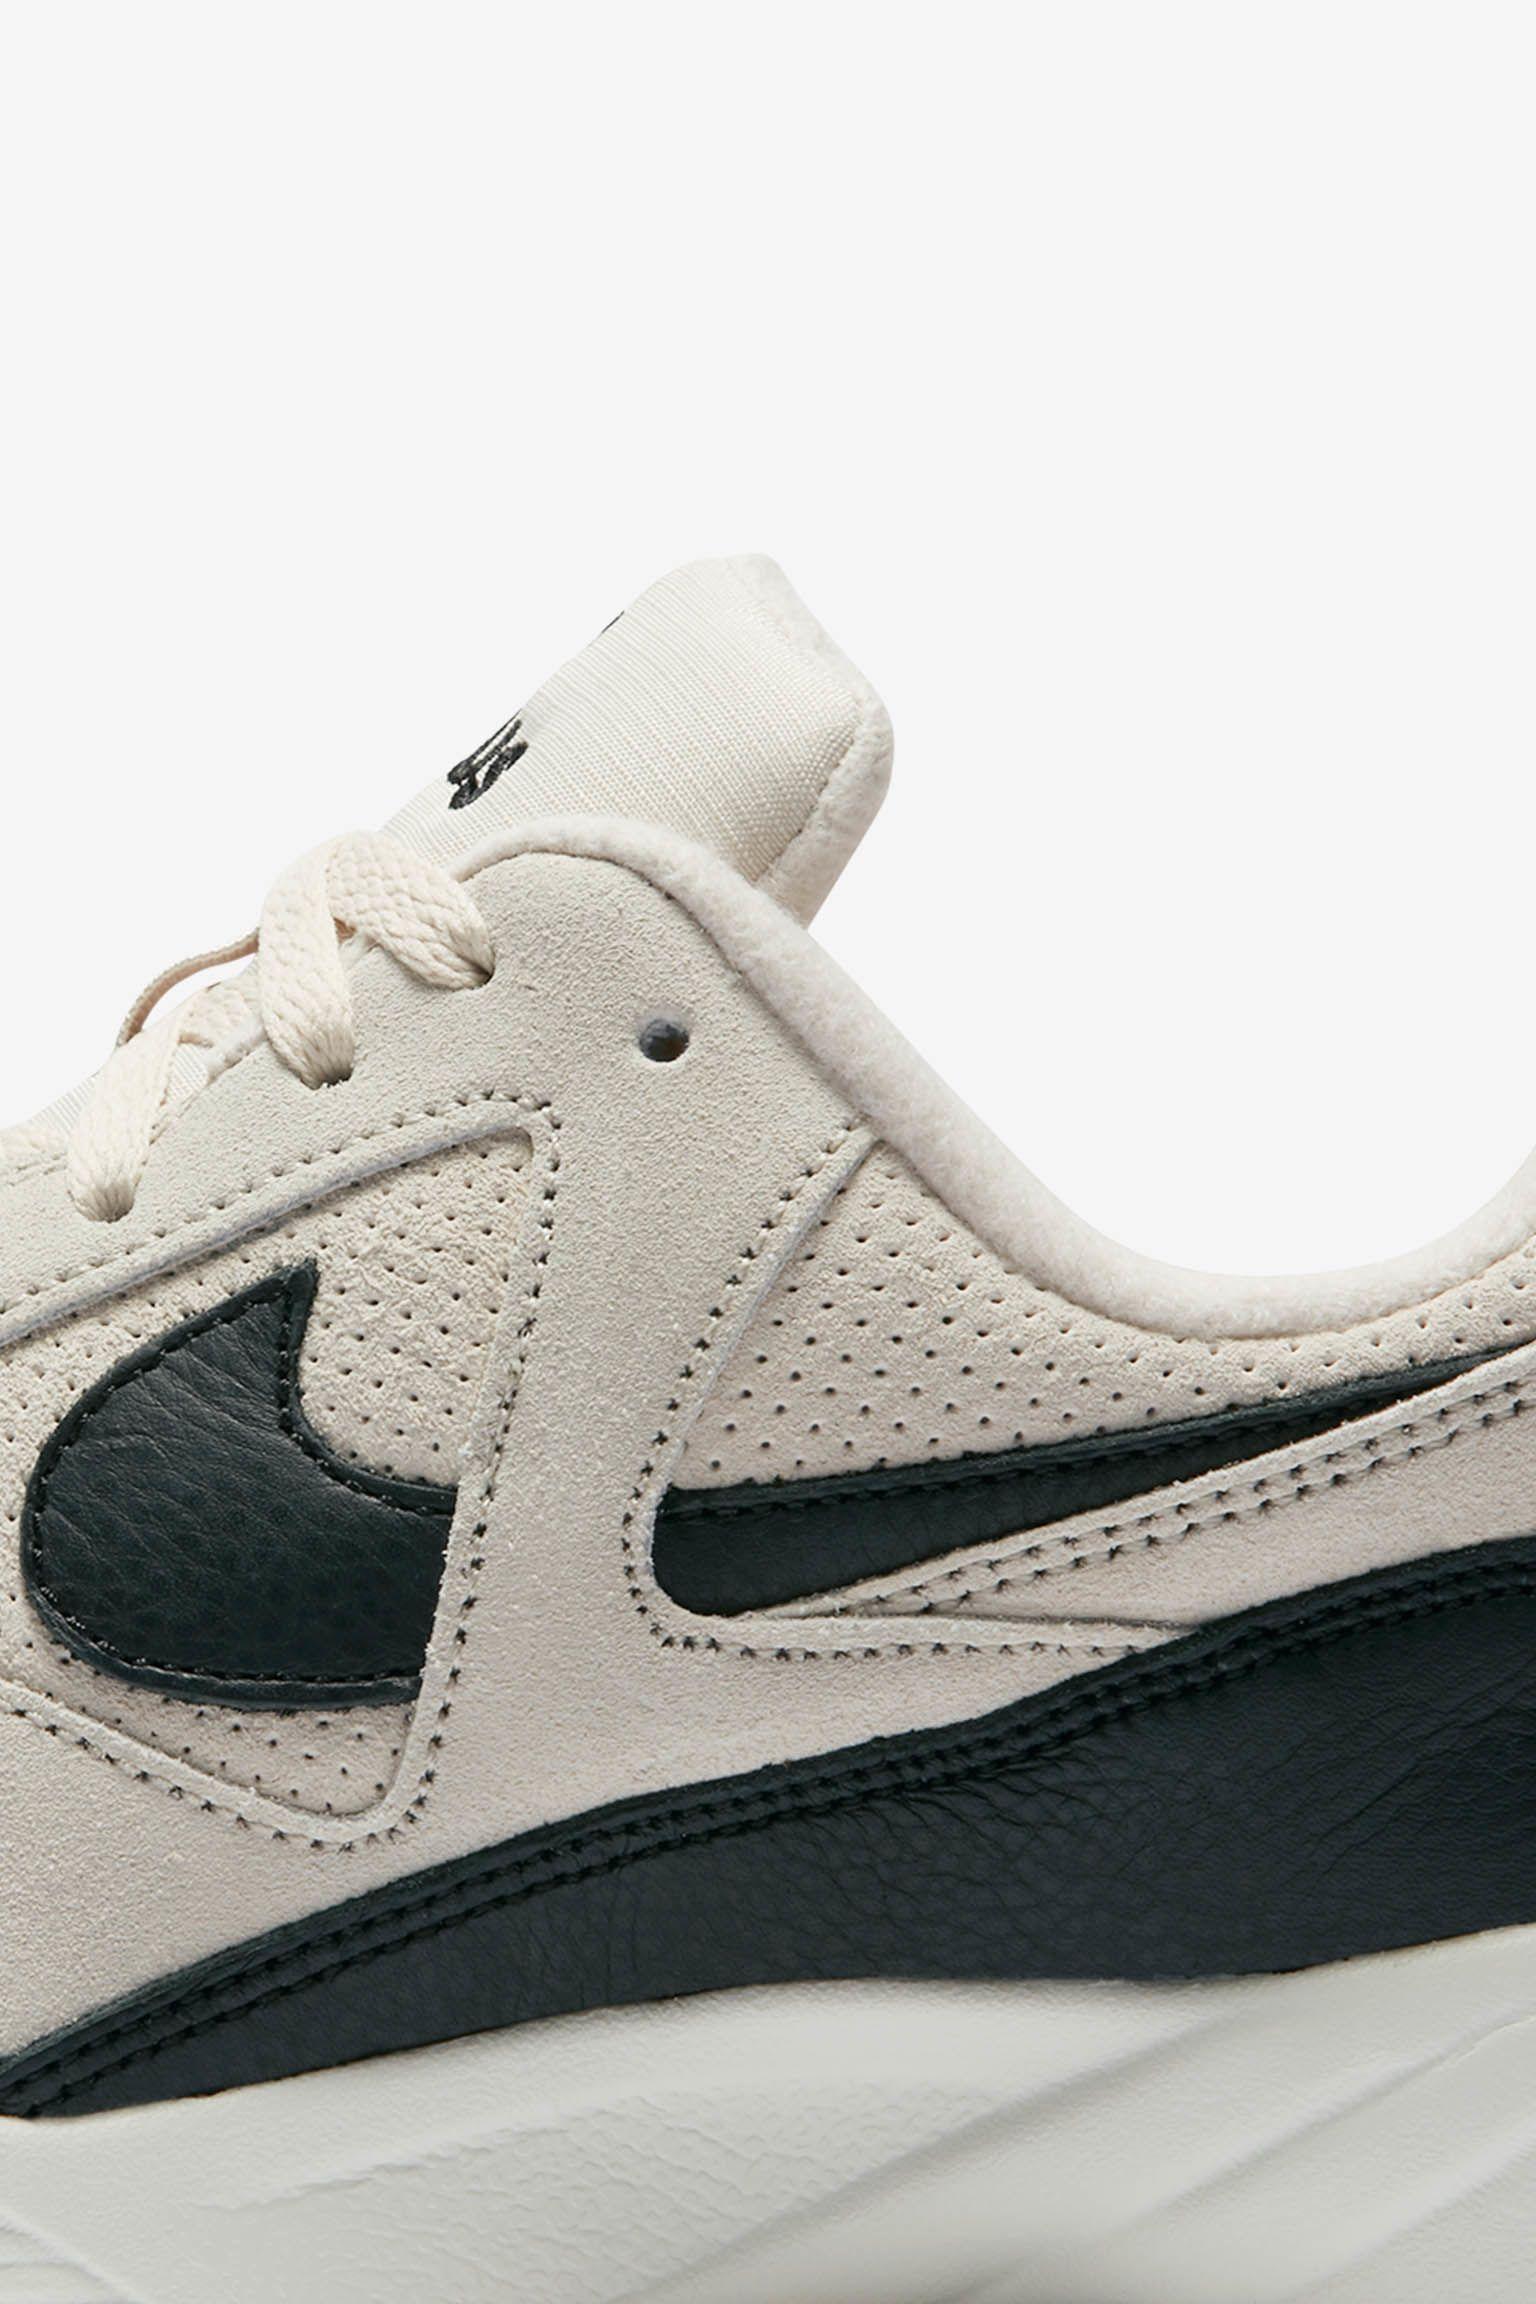 Nike Air Icarus Extra 'Light Orewood Brown & Black